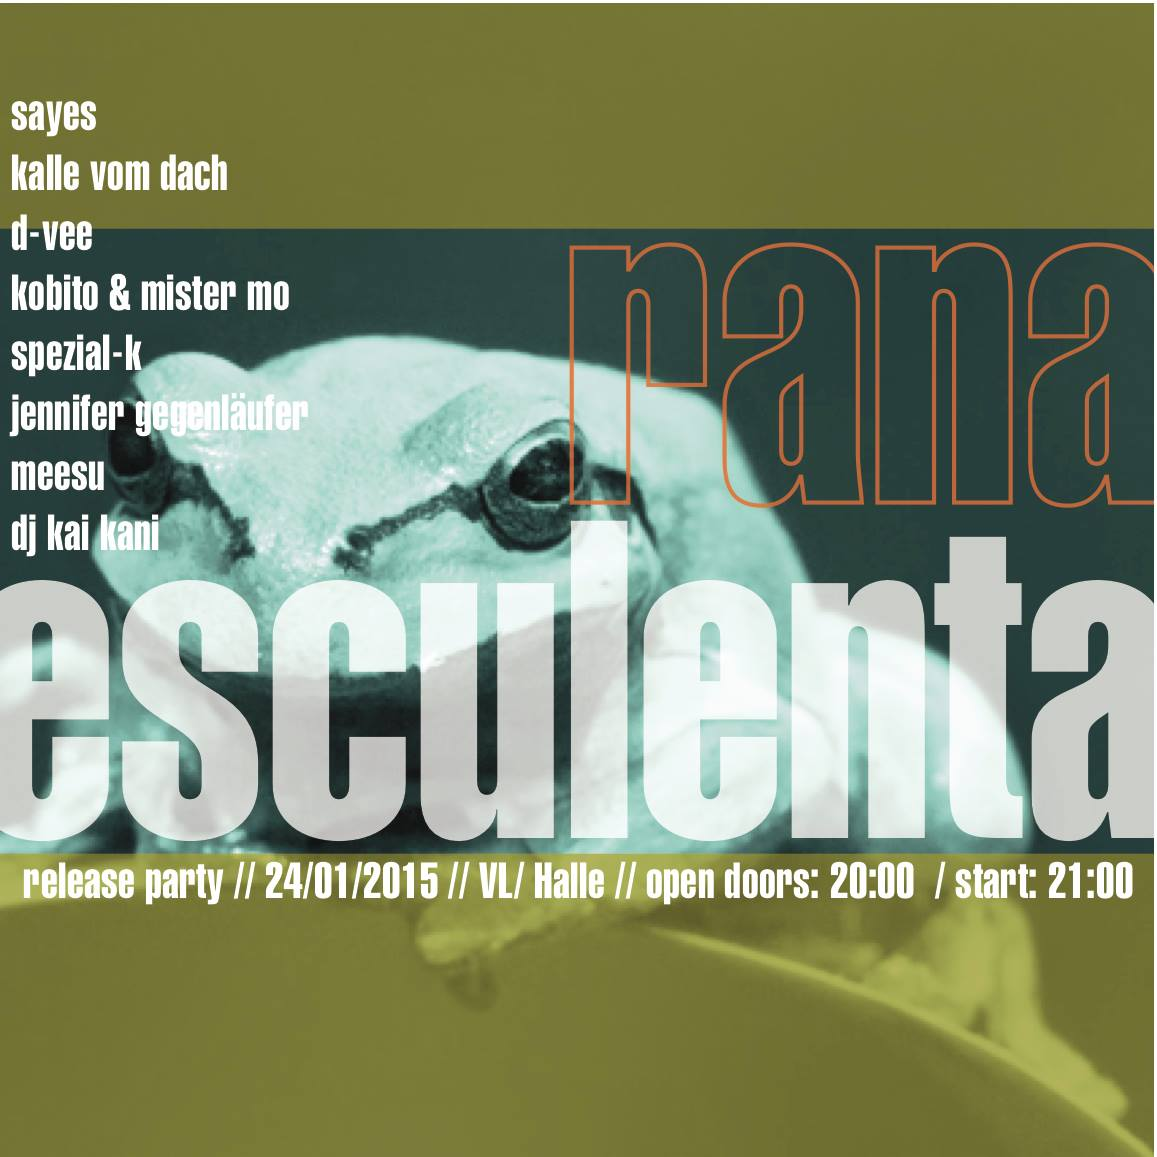 Rana Esculenta Release-Party